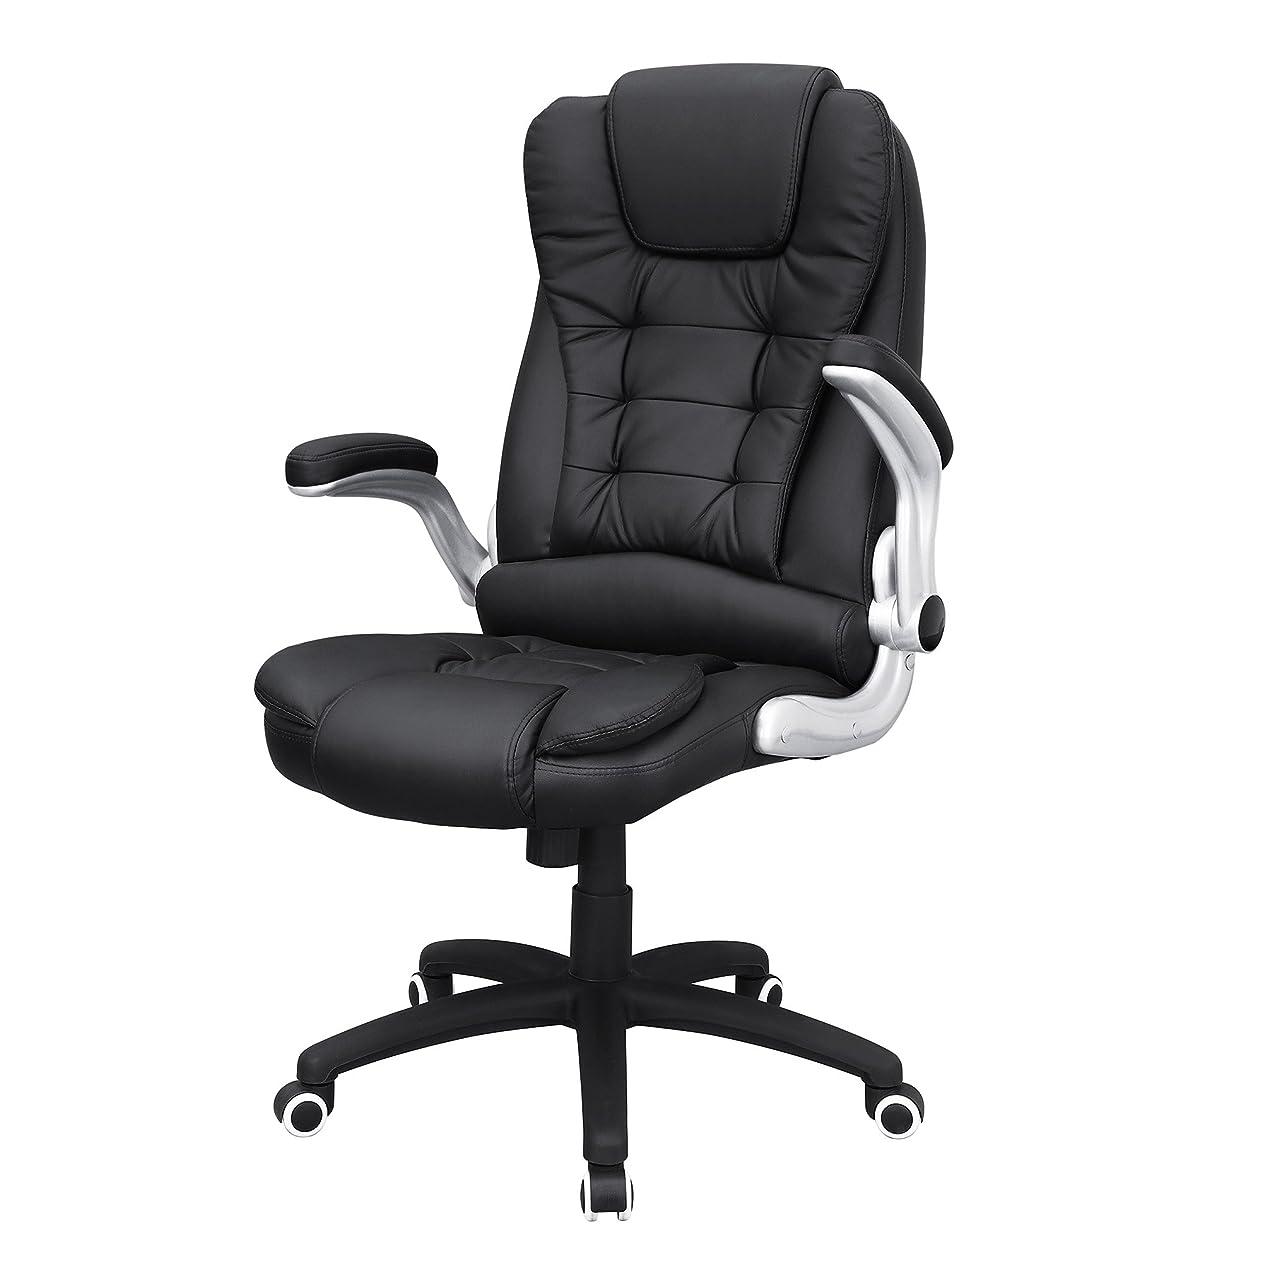 SONGMICS オフィスチェア 社長椅子 パソコンチェア 座面昇降 ハイバック PUレザー 机下に収納可 NOBG51B